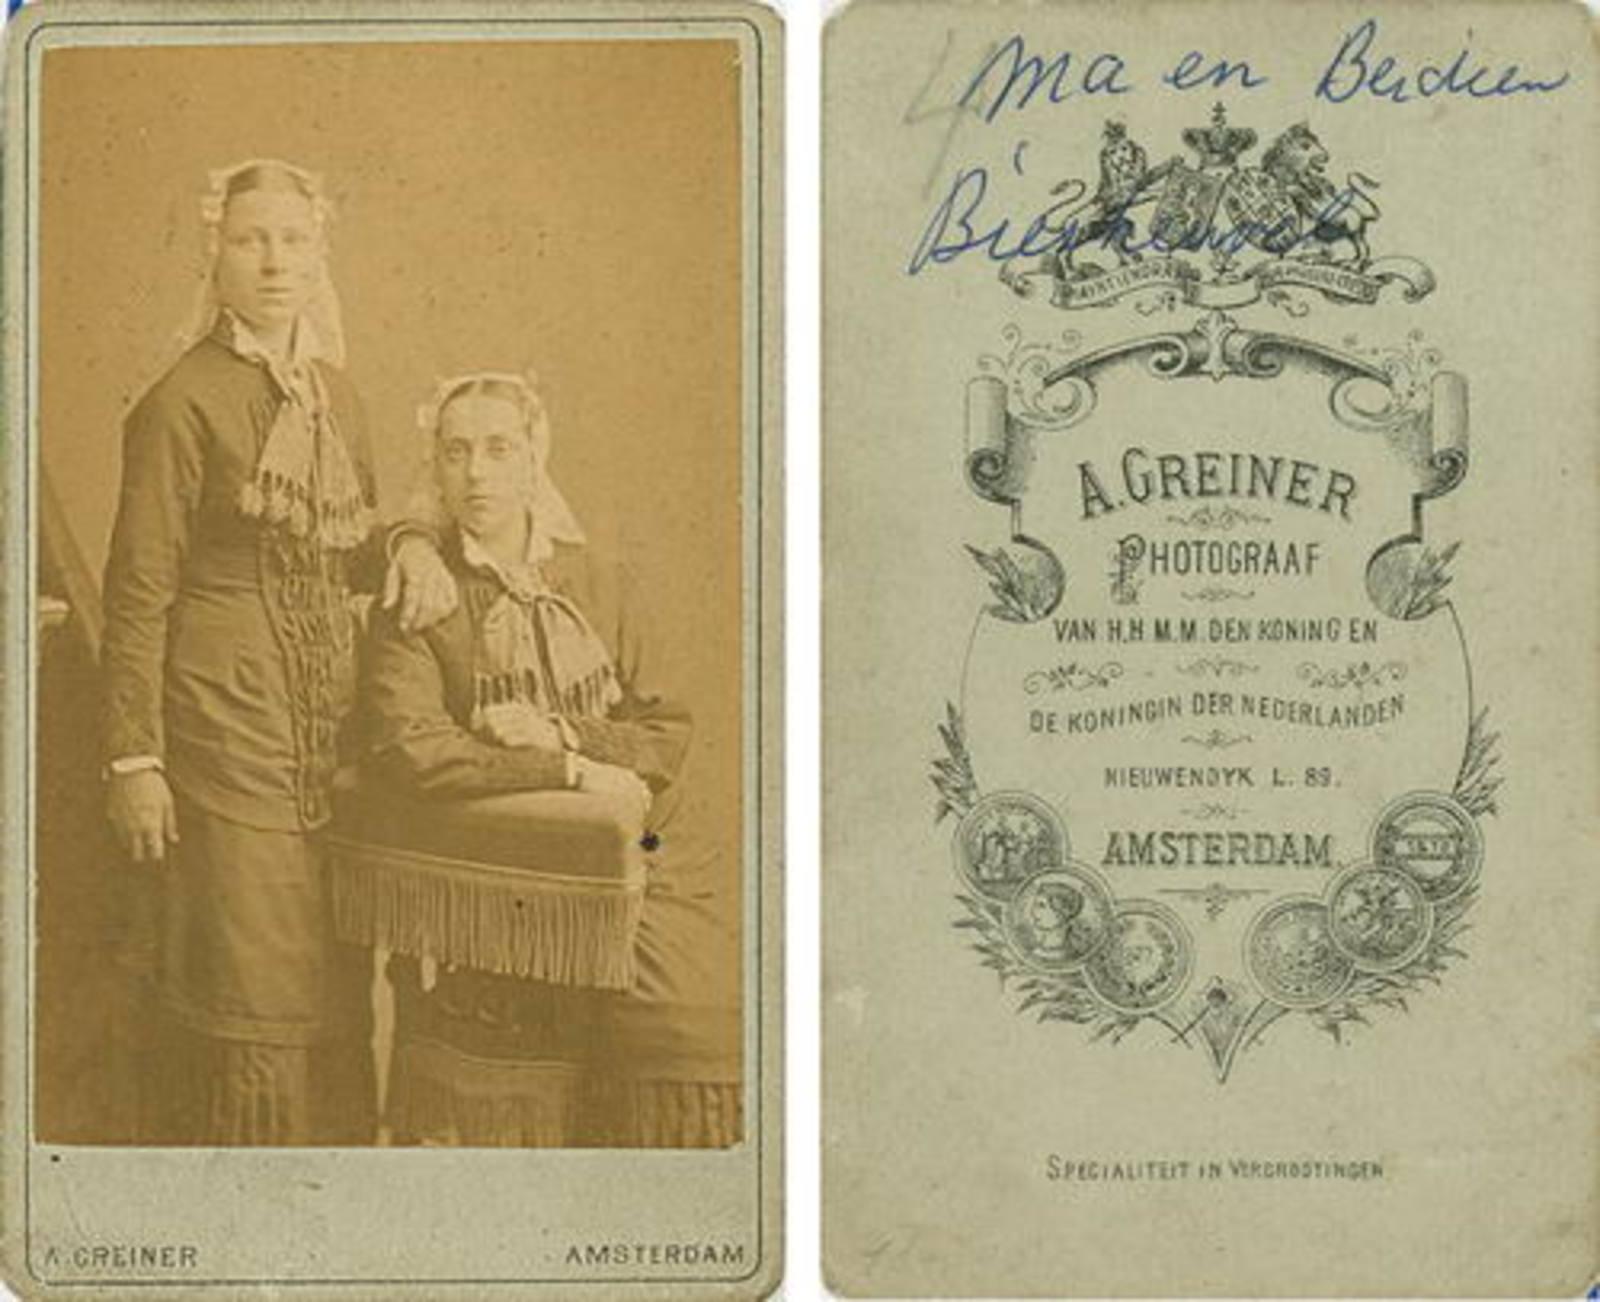 Biesheuvel Christiaan Wzn 1835 19__ dochters Ma en Berdien bij Fotograaf